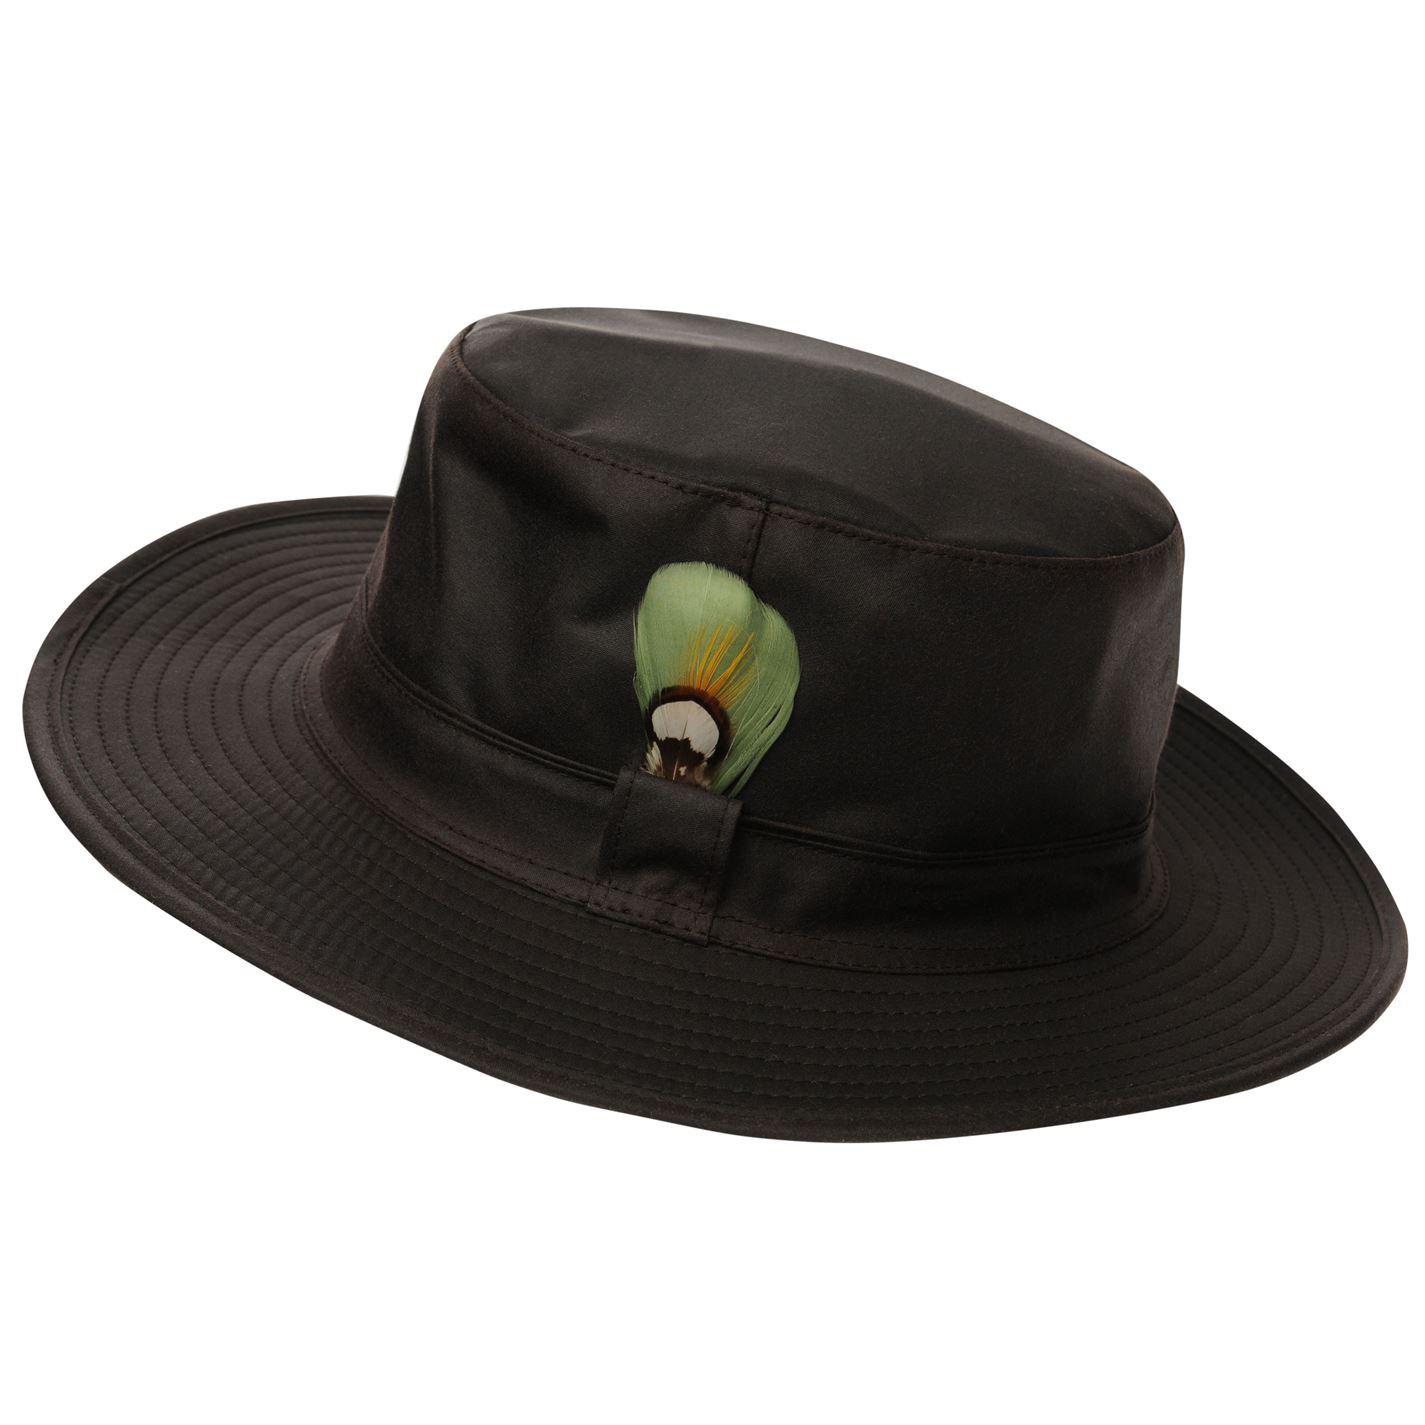 53b5c652446 Jack Murphy Mens Waxed Hat Aussie Robinsons New